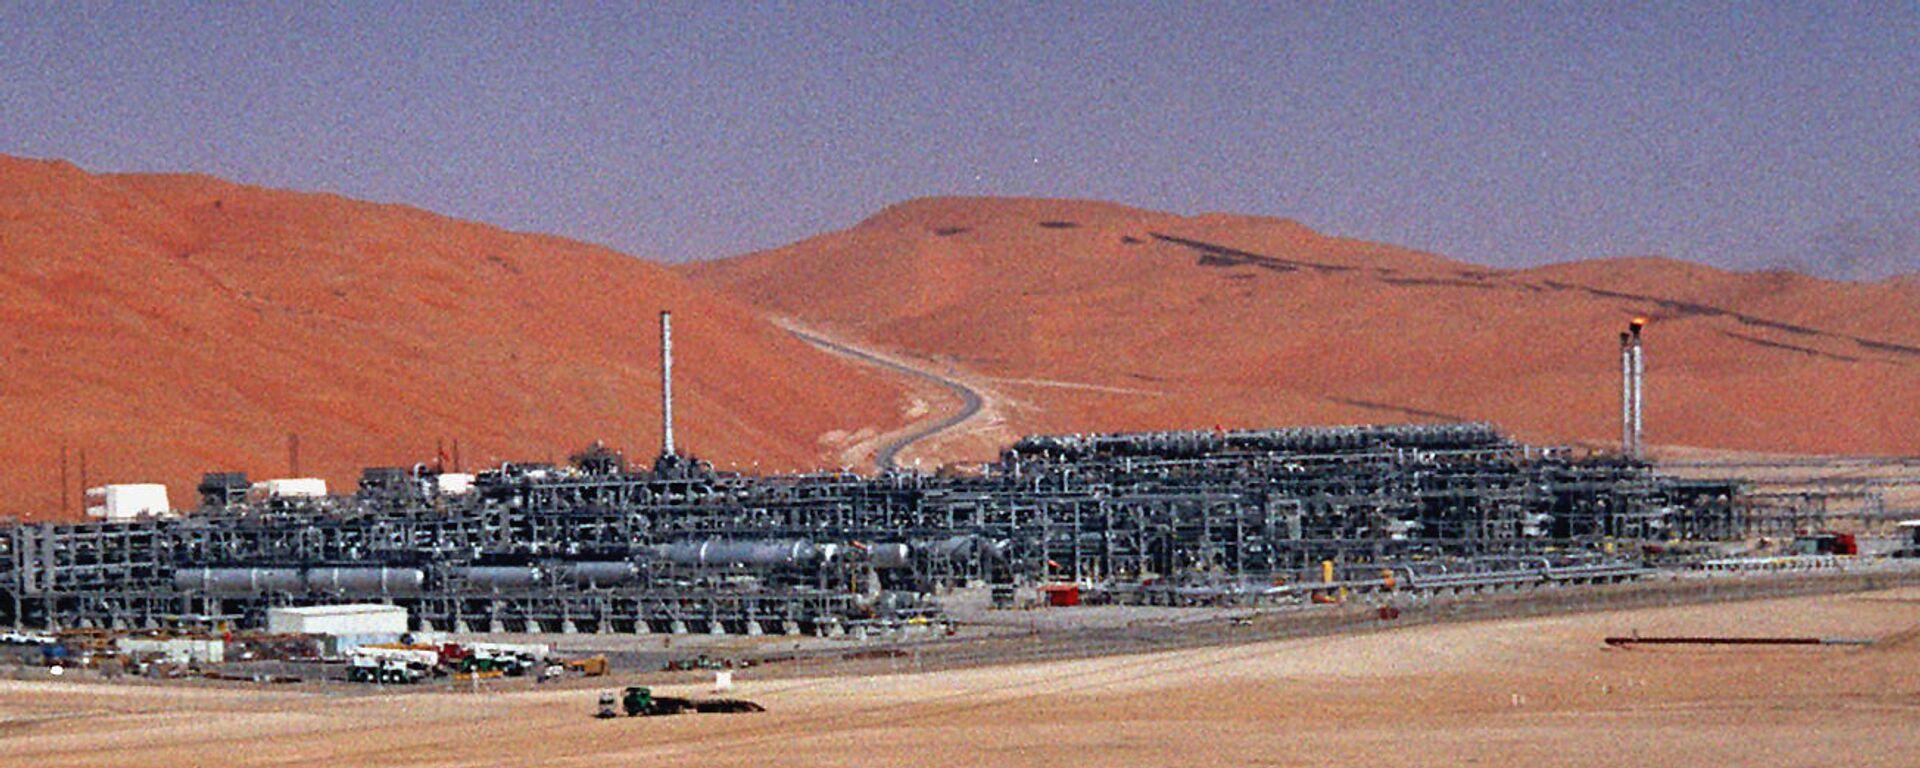 Impianto produzione gas Saudi Aramco - Sputnik Italia, 1920, 27.12.2020